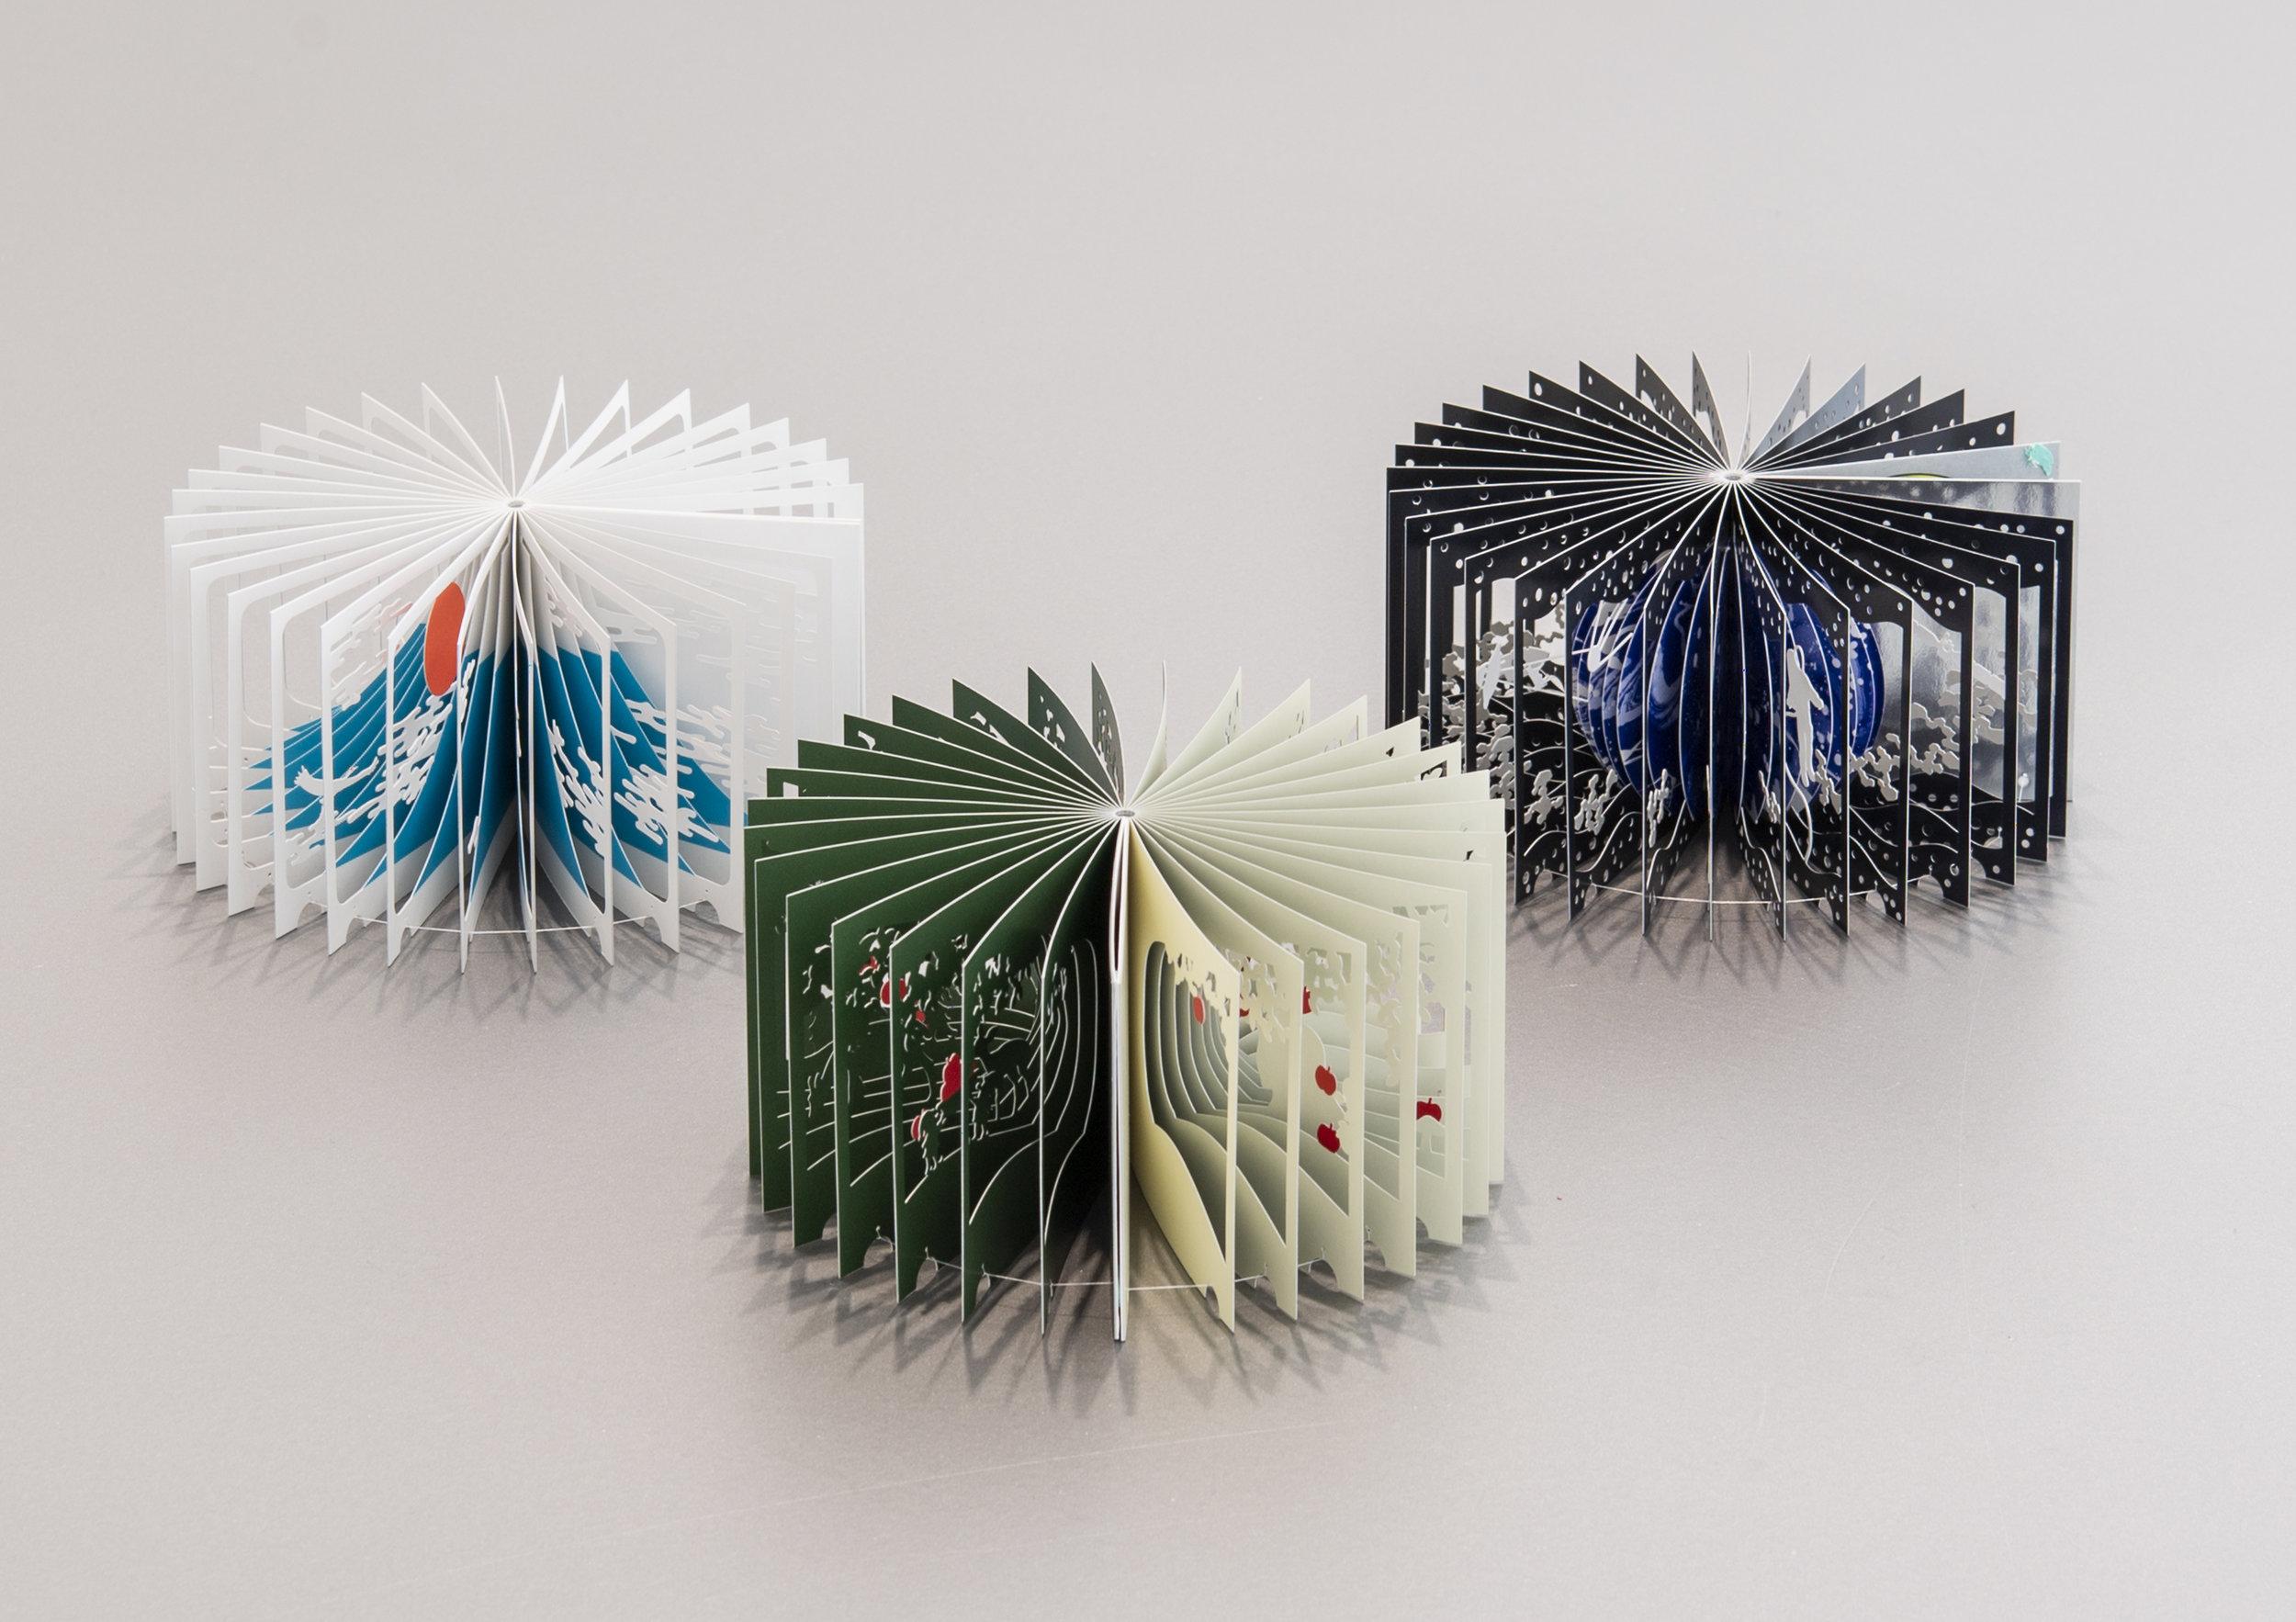 Installation view of Yusuke Oono's work, Al Hamriyah Studio, Sharjah Art Foundation, 2018. Mixed Media Installation, dimensions variable. Image courtesy of Sharjah Art Foundation